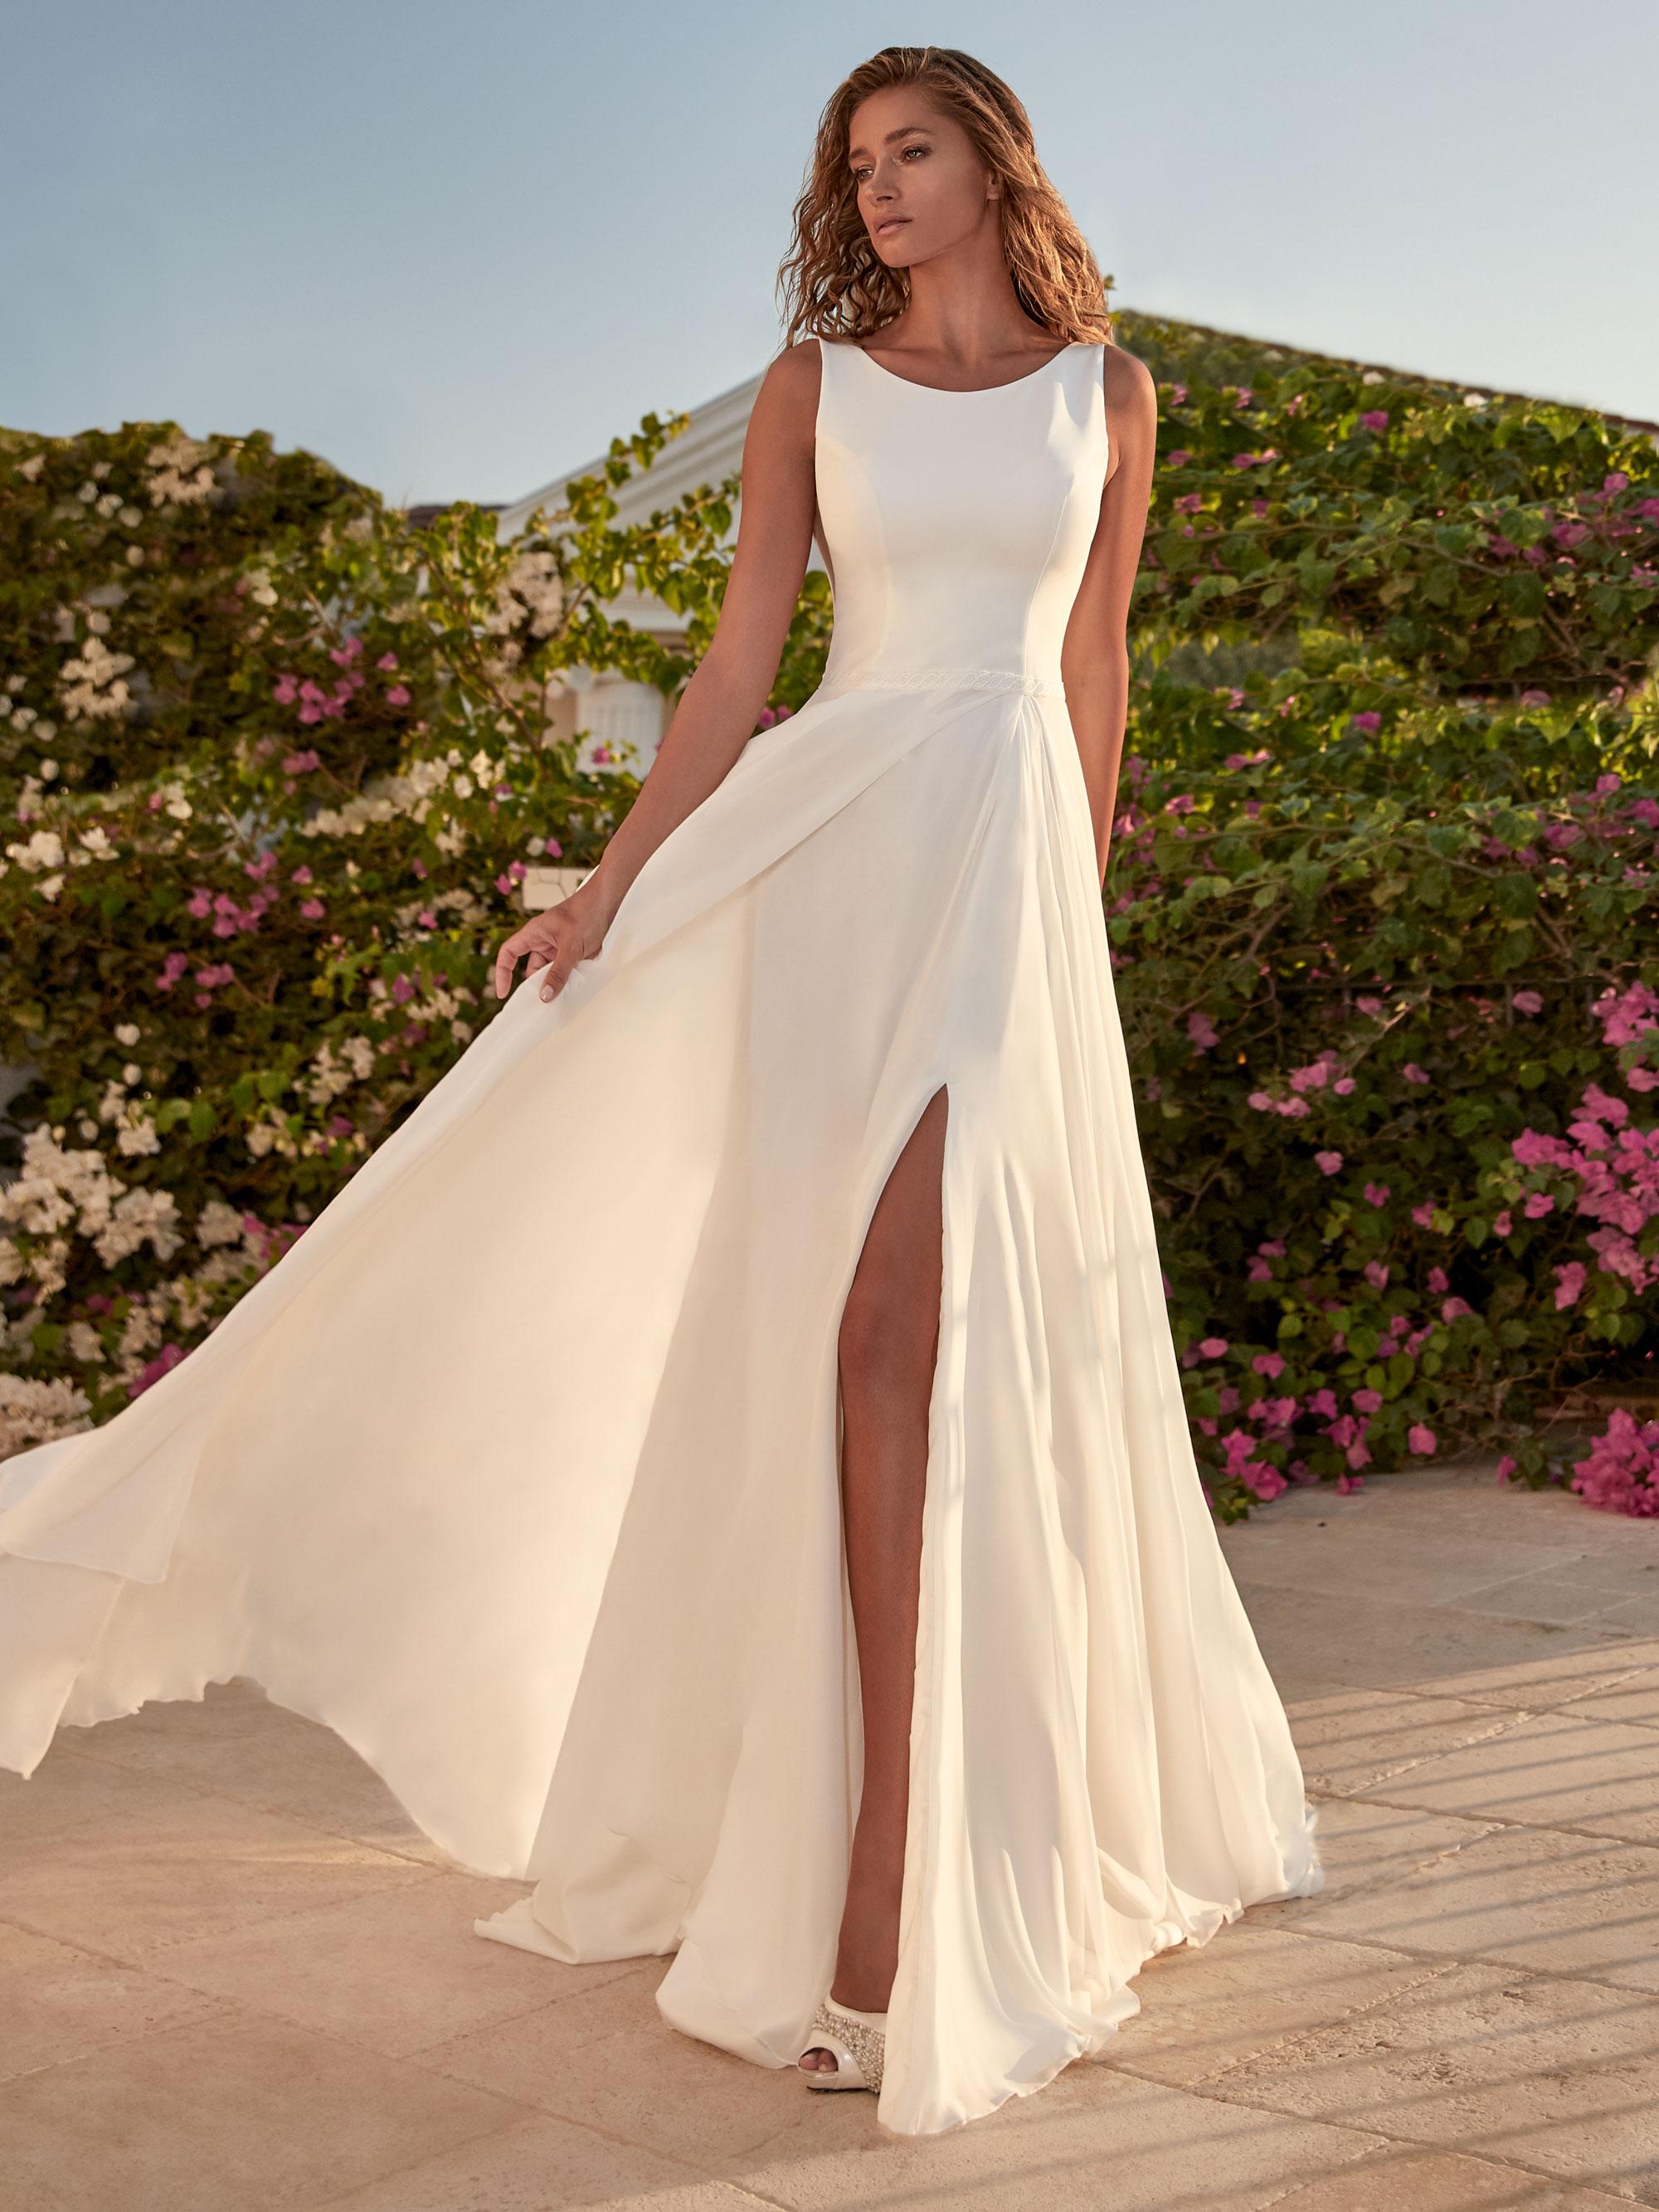 Robe de mariée fluide Tressin - White Boutik